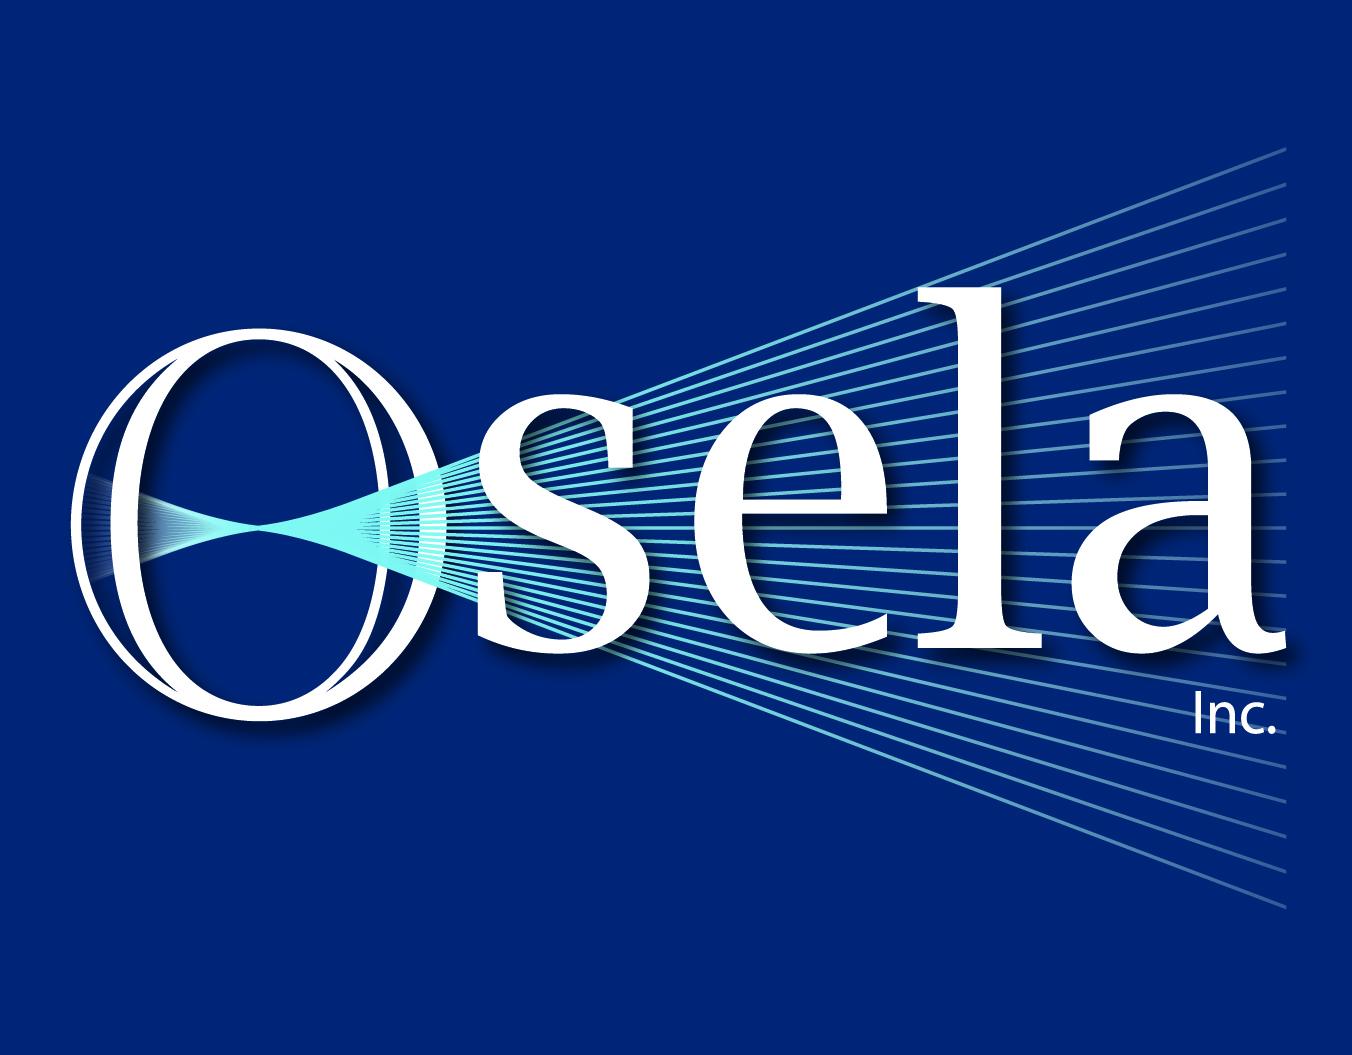 Osela Inc.